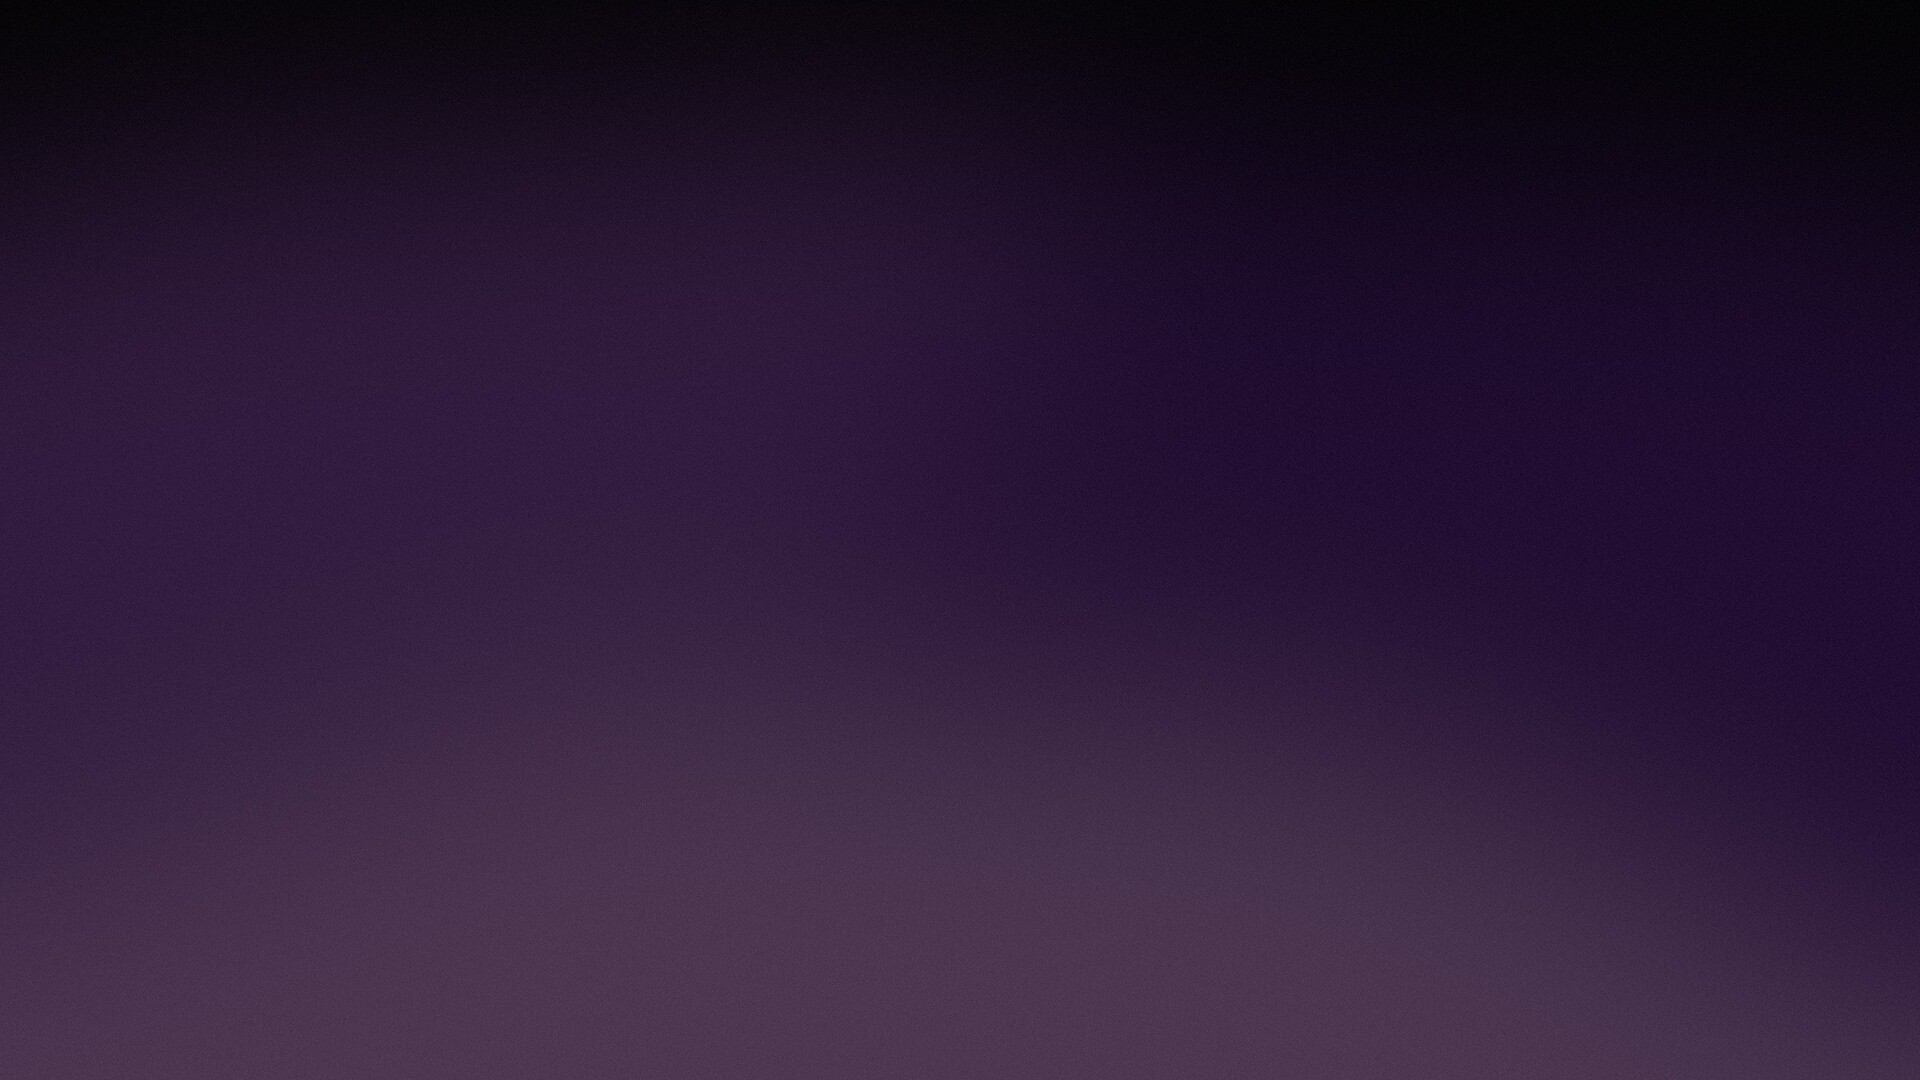 1920x1080 Purple Abstract Hd Laptop Full Hd 1080p Hd 4k